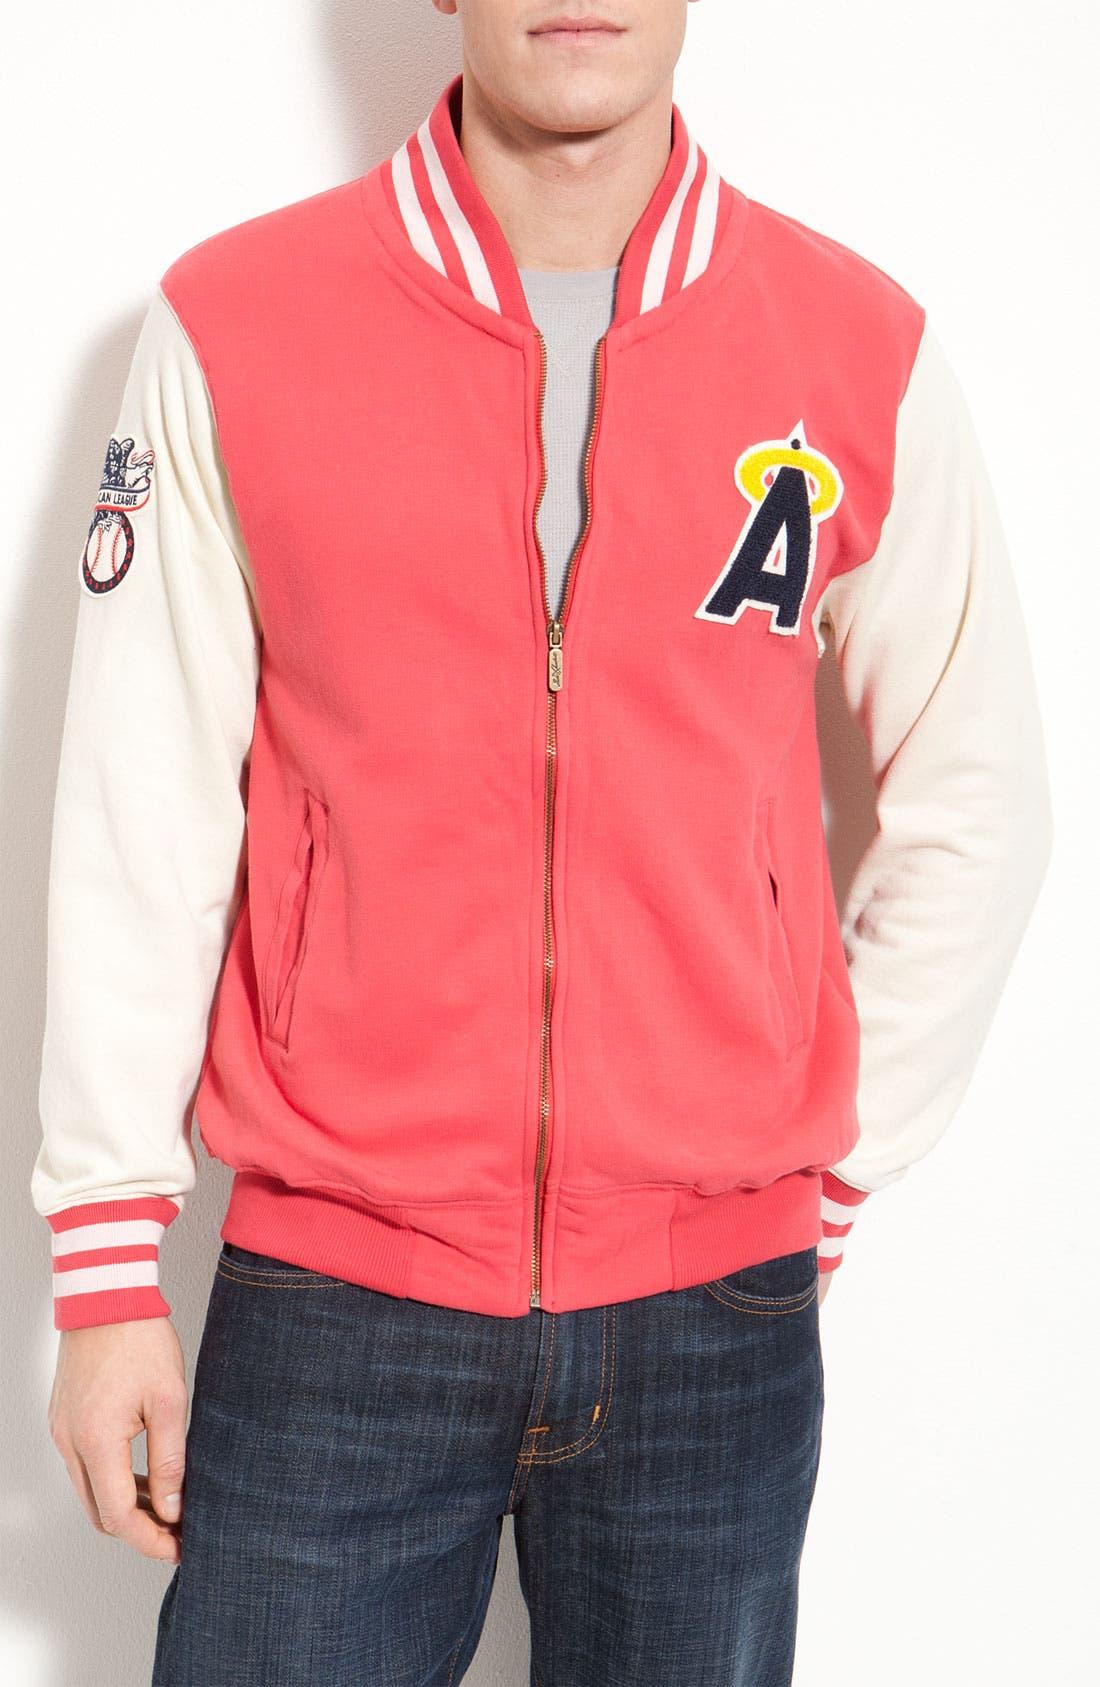 Alternate Image 1 Selected - Red Jacket 'Homeroom Angels' Jacket